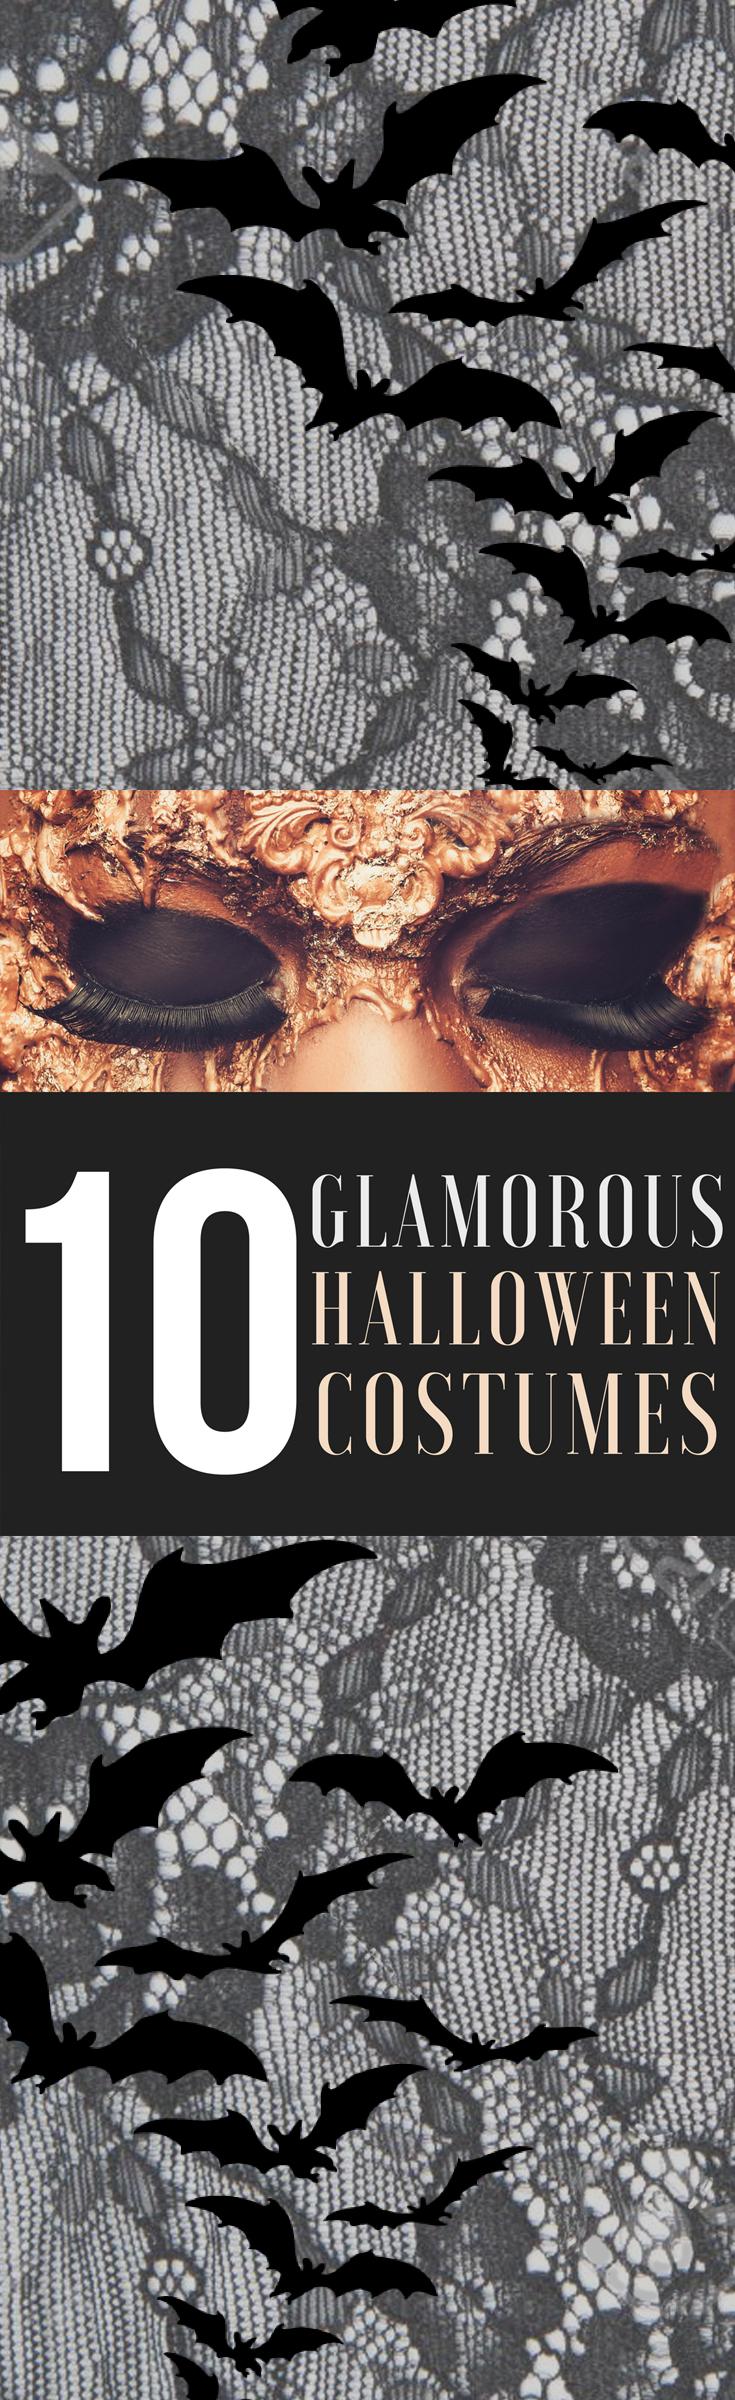 10-Glamorous-Halloween-Costumes